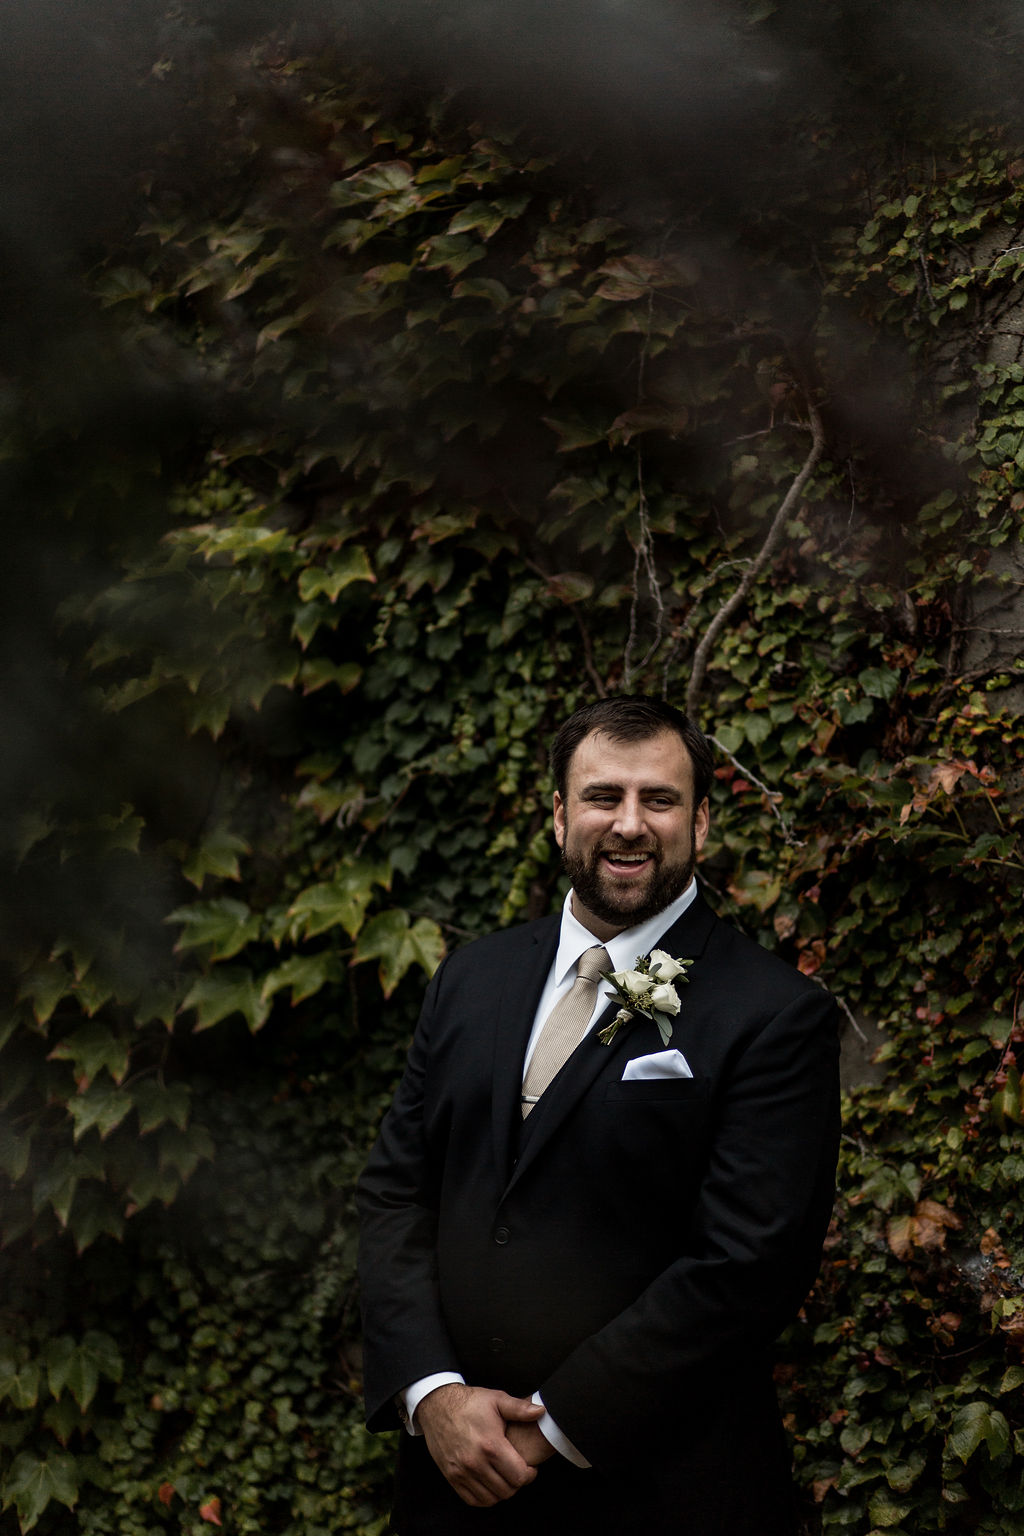 best_midwest_wedding_photographer_JMH_photography-50.jpg